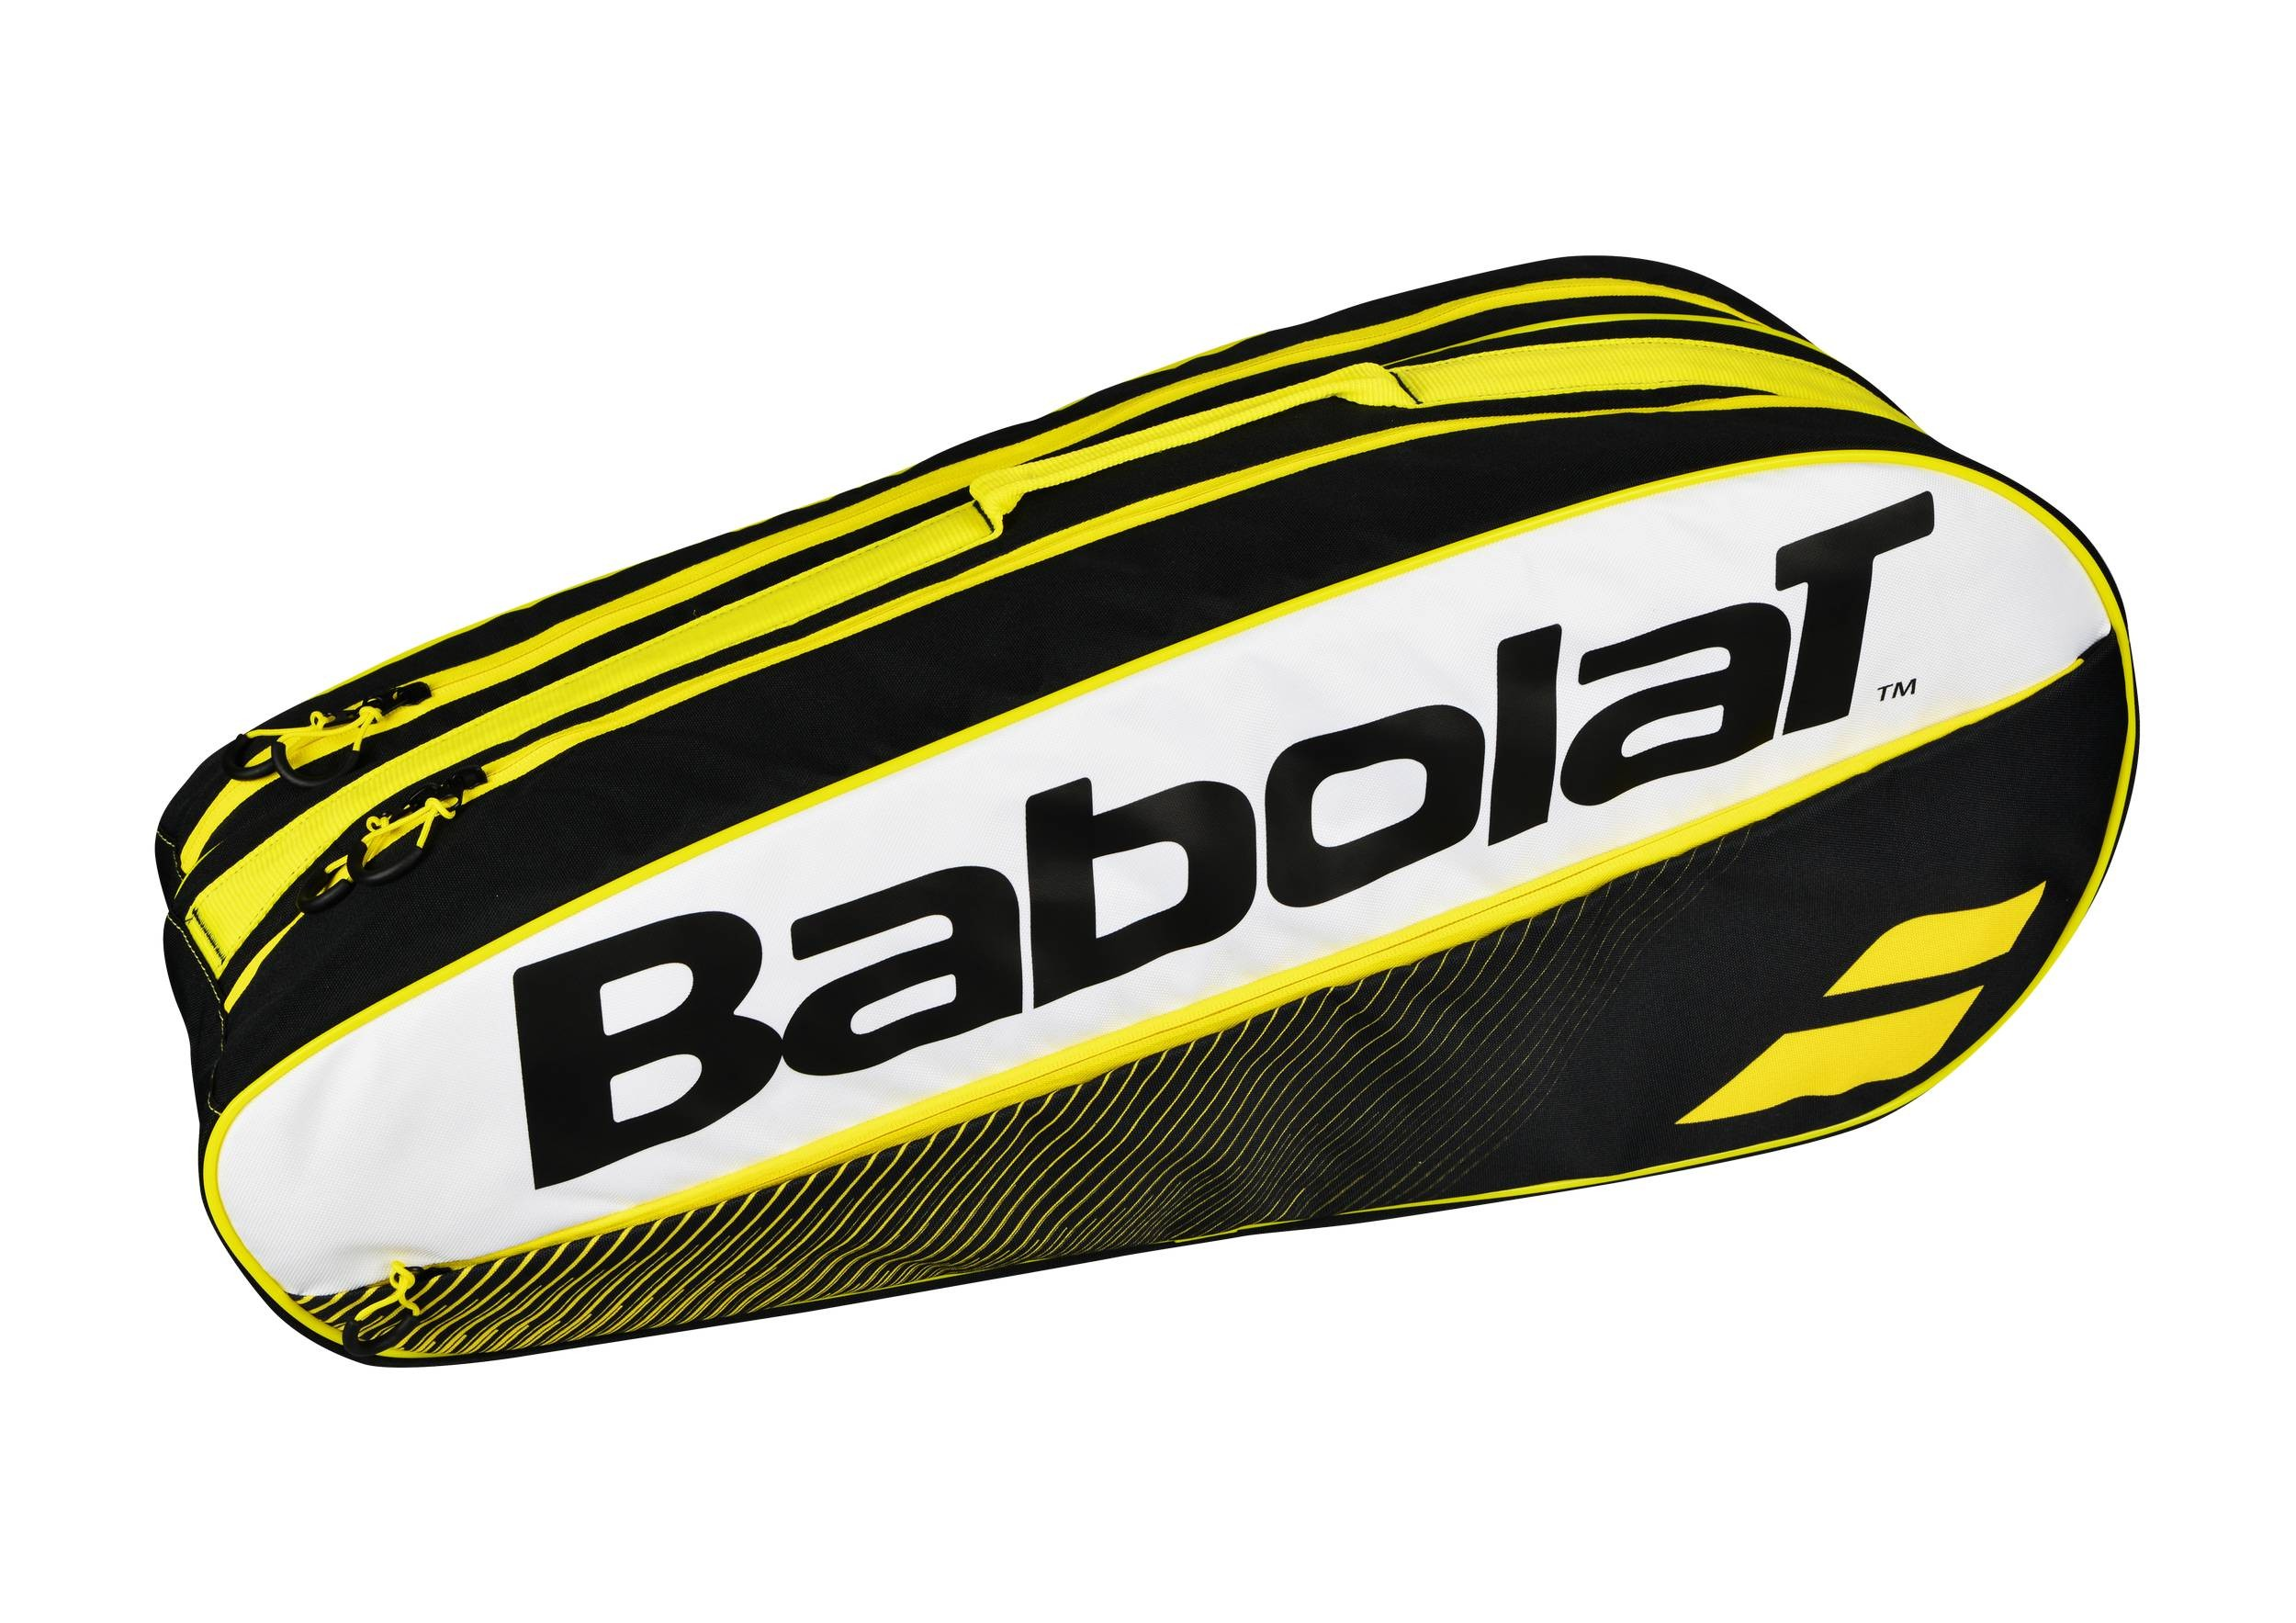 Torba tenisowa Babolat Essential x6 Yellow